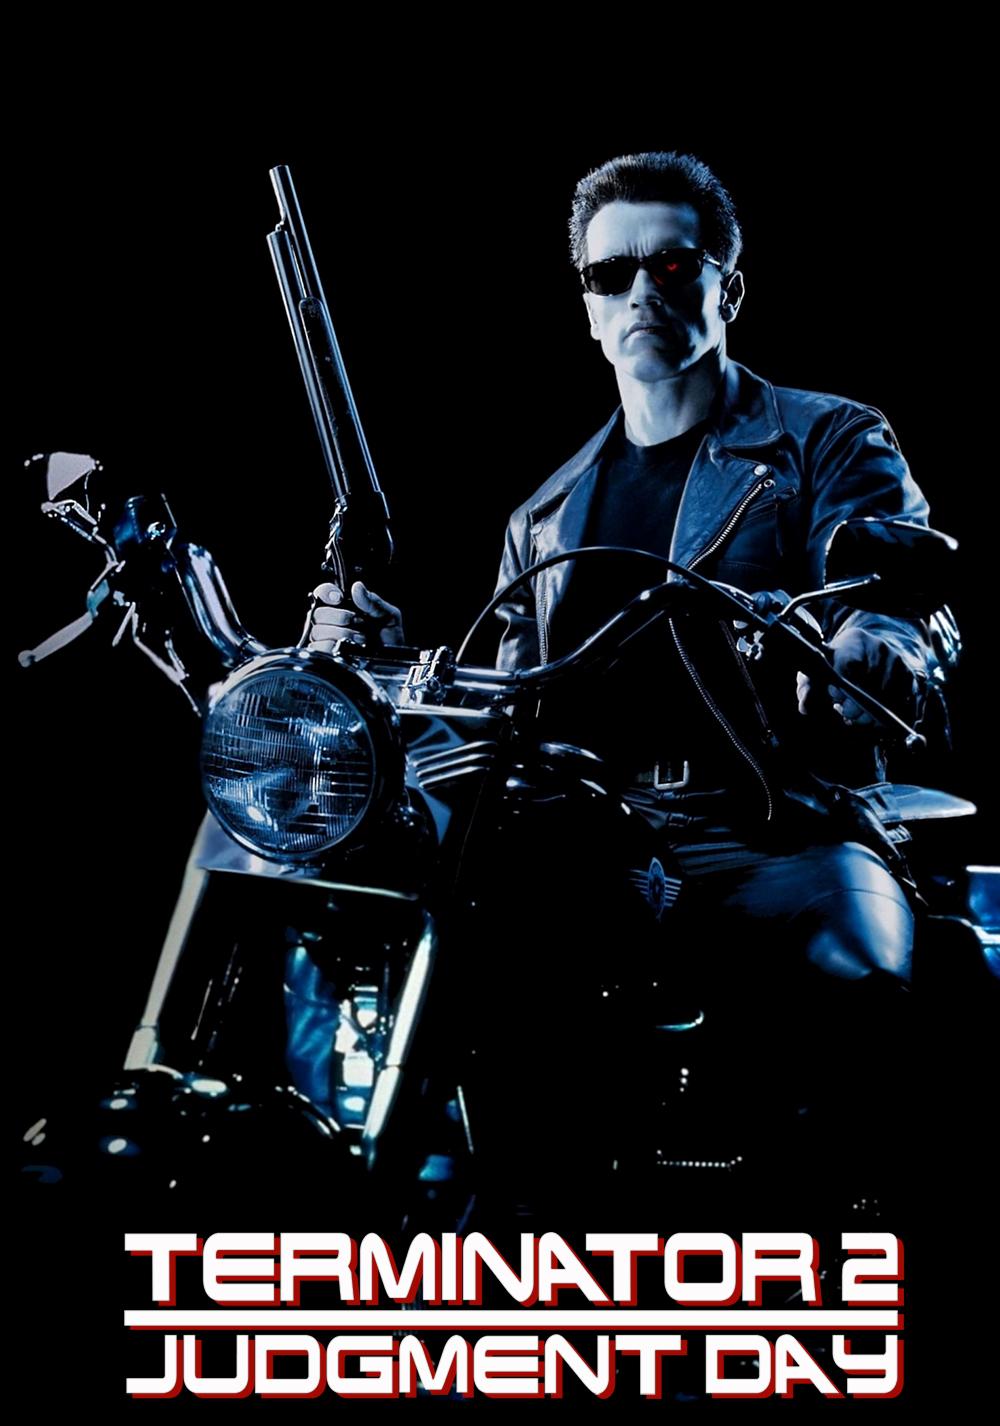 Terminator-2-Judgment-Day-1991-2.jpg